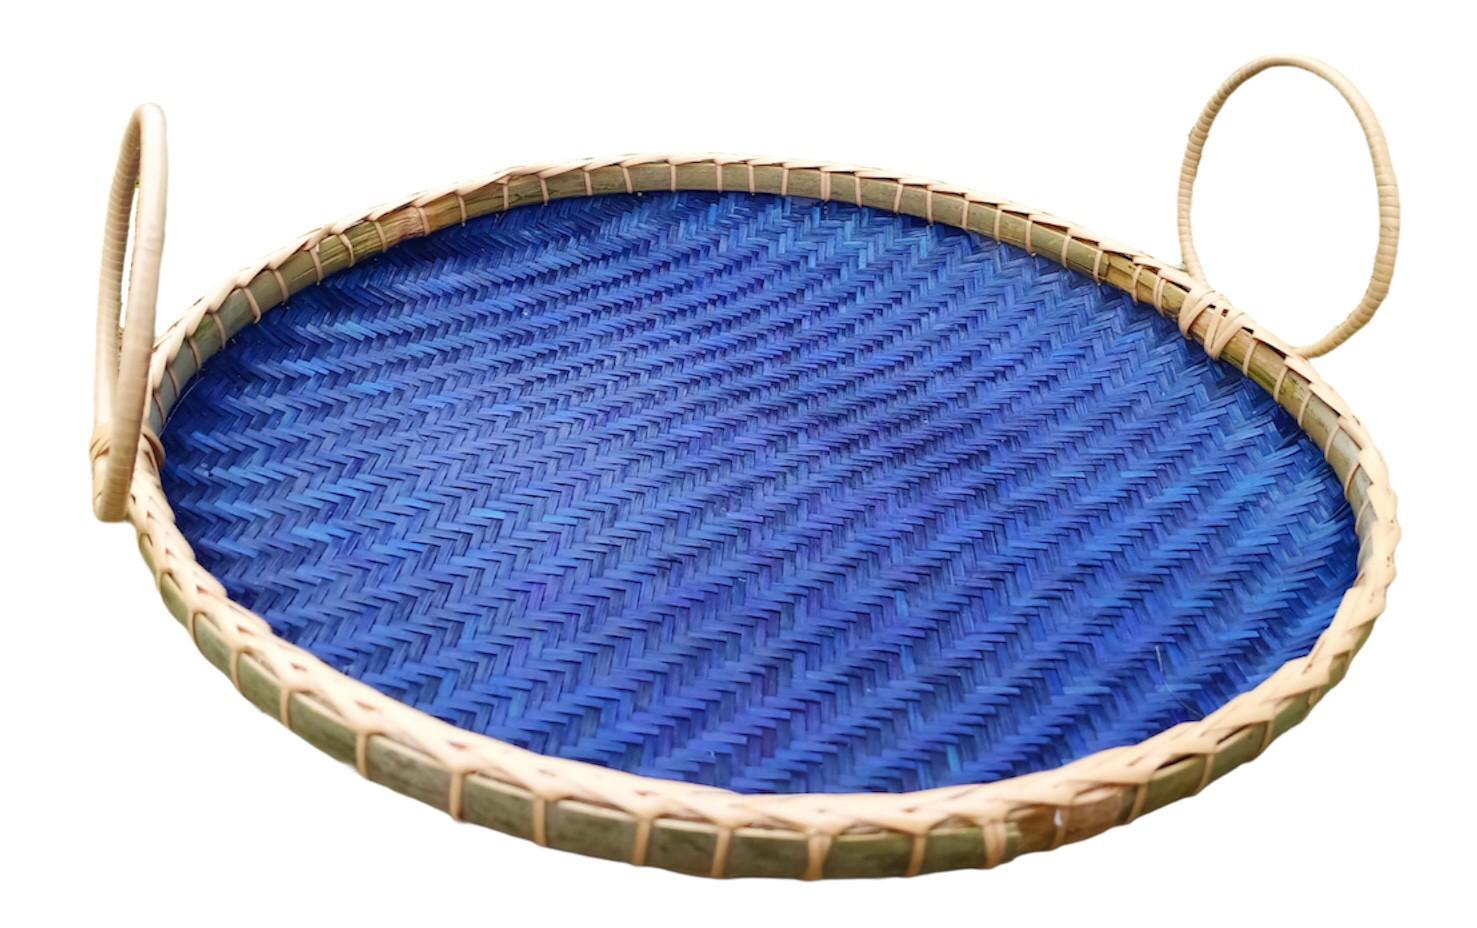 Circle basket Bam boo Blue